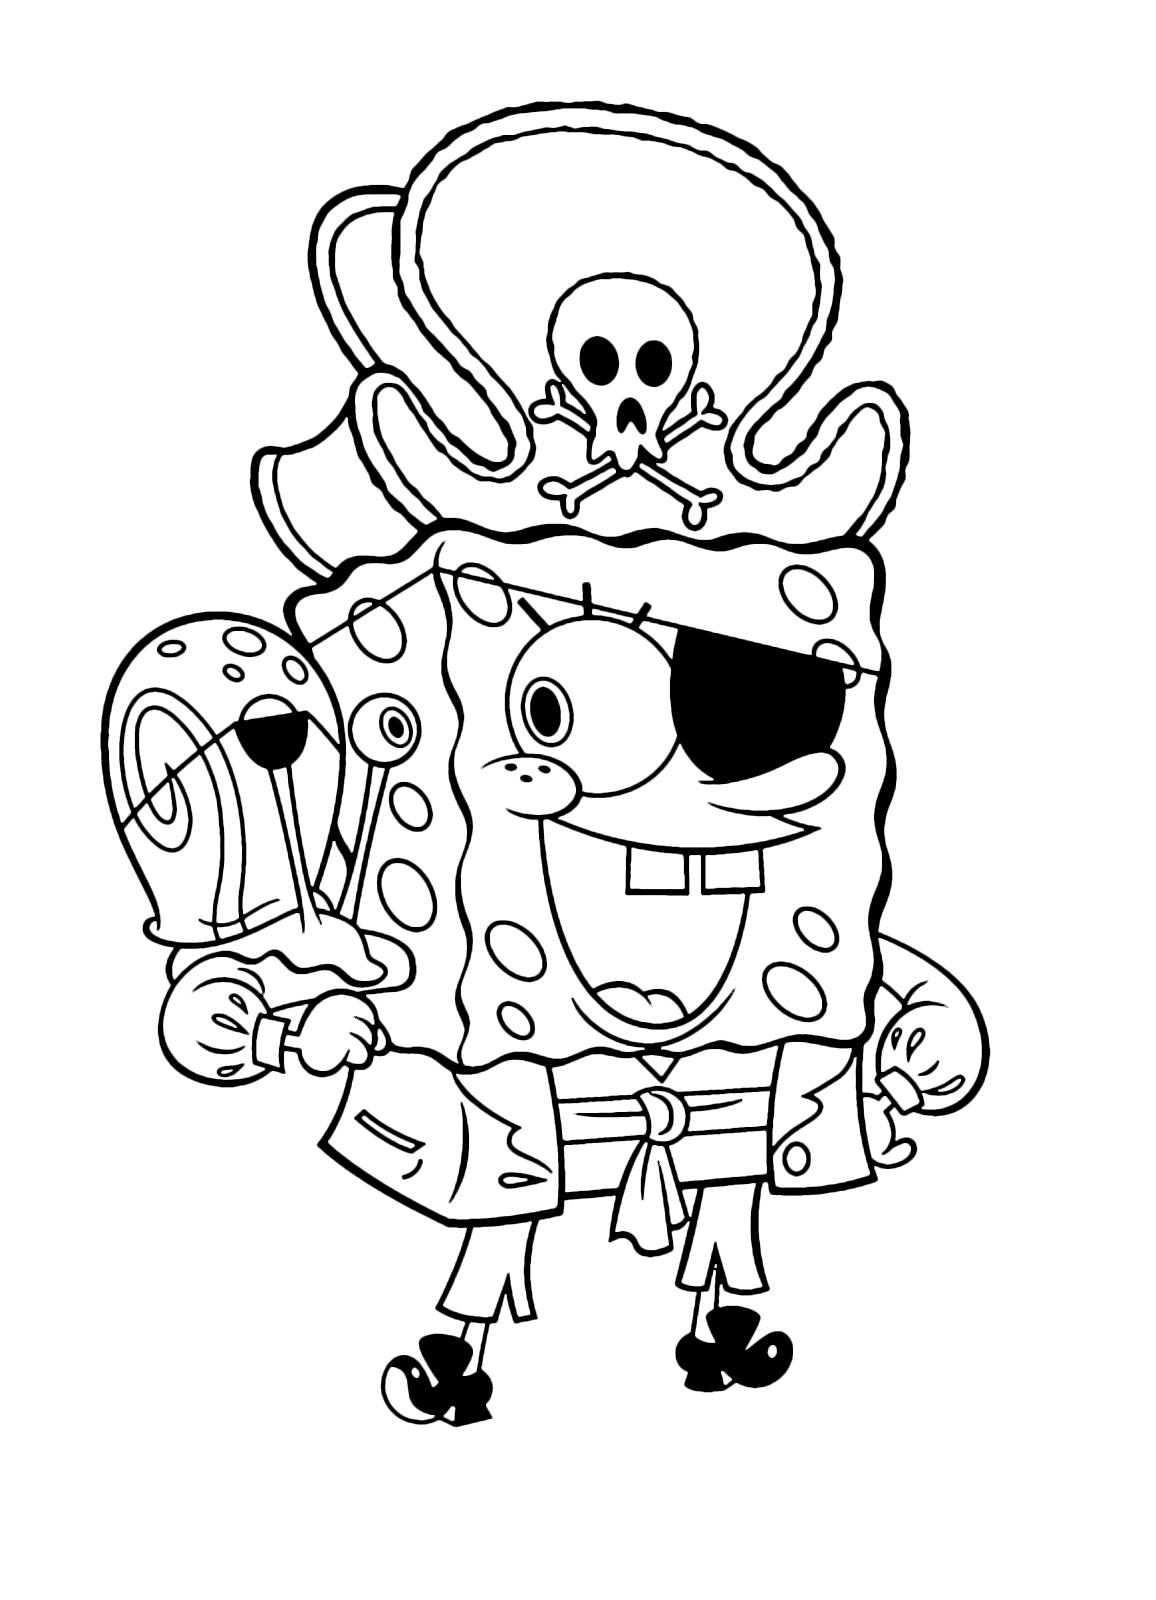 Spongebob spongebob vestito da pirata con gary la lumaca for Disegni spongebob